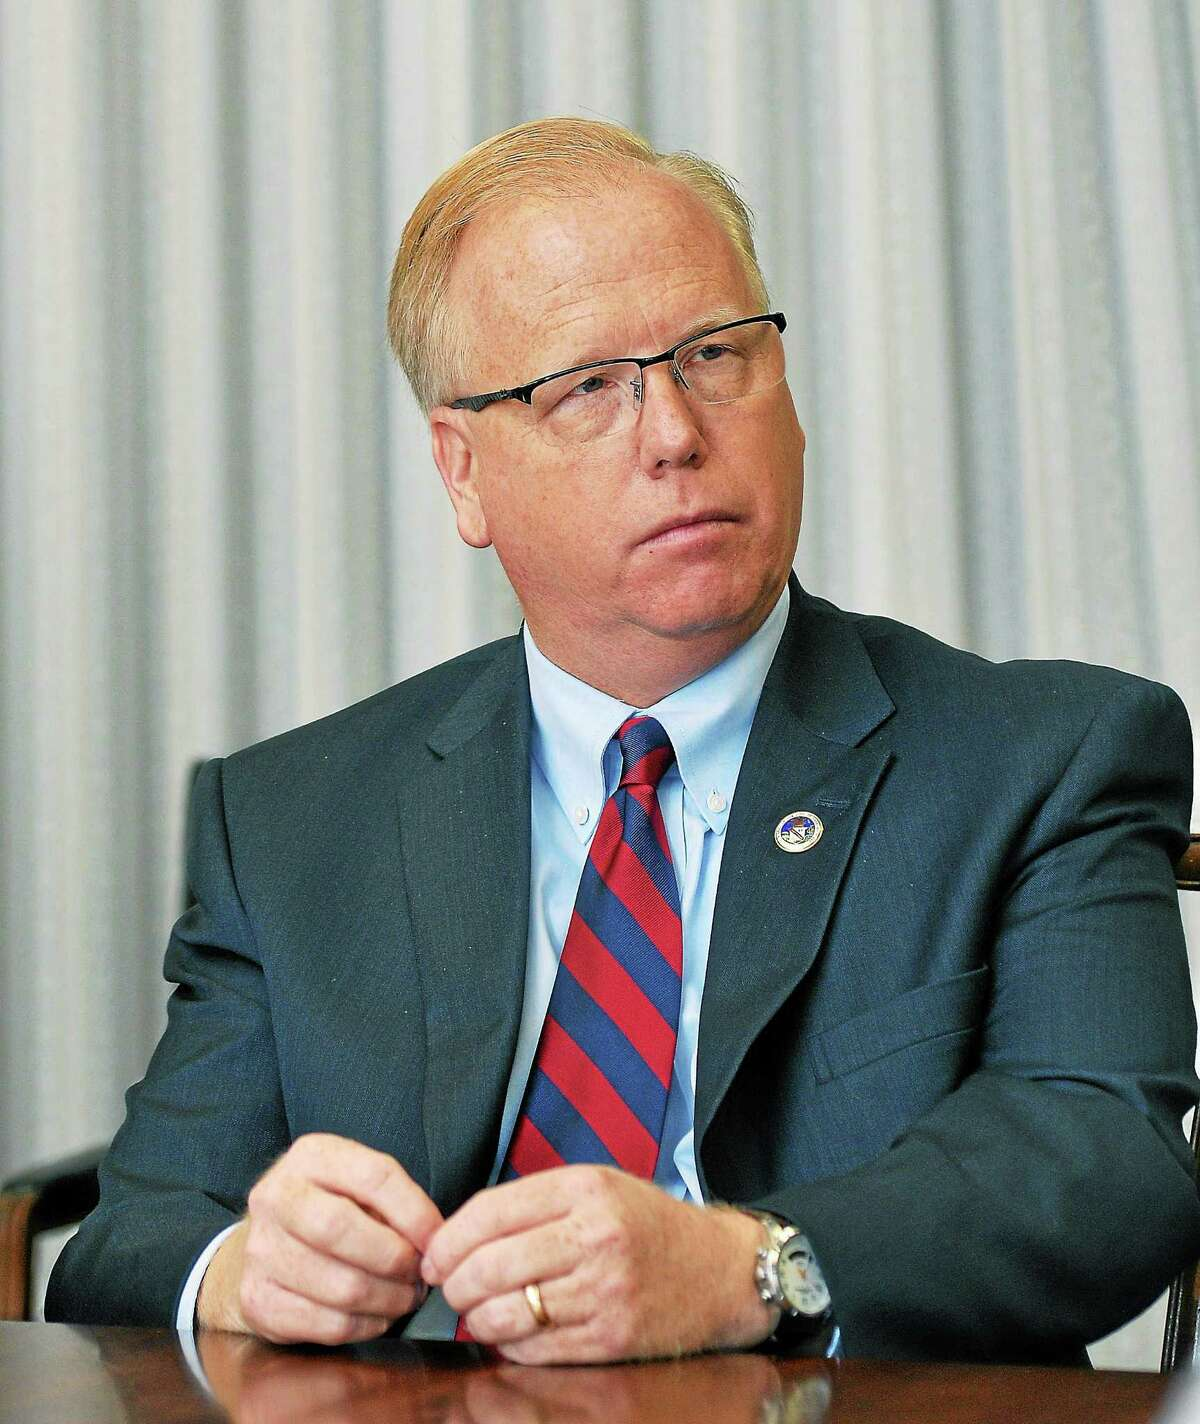 GOP Candidate for Governor, Danbury mayor Mark Boughton